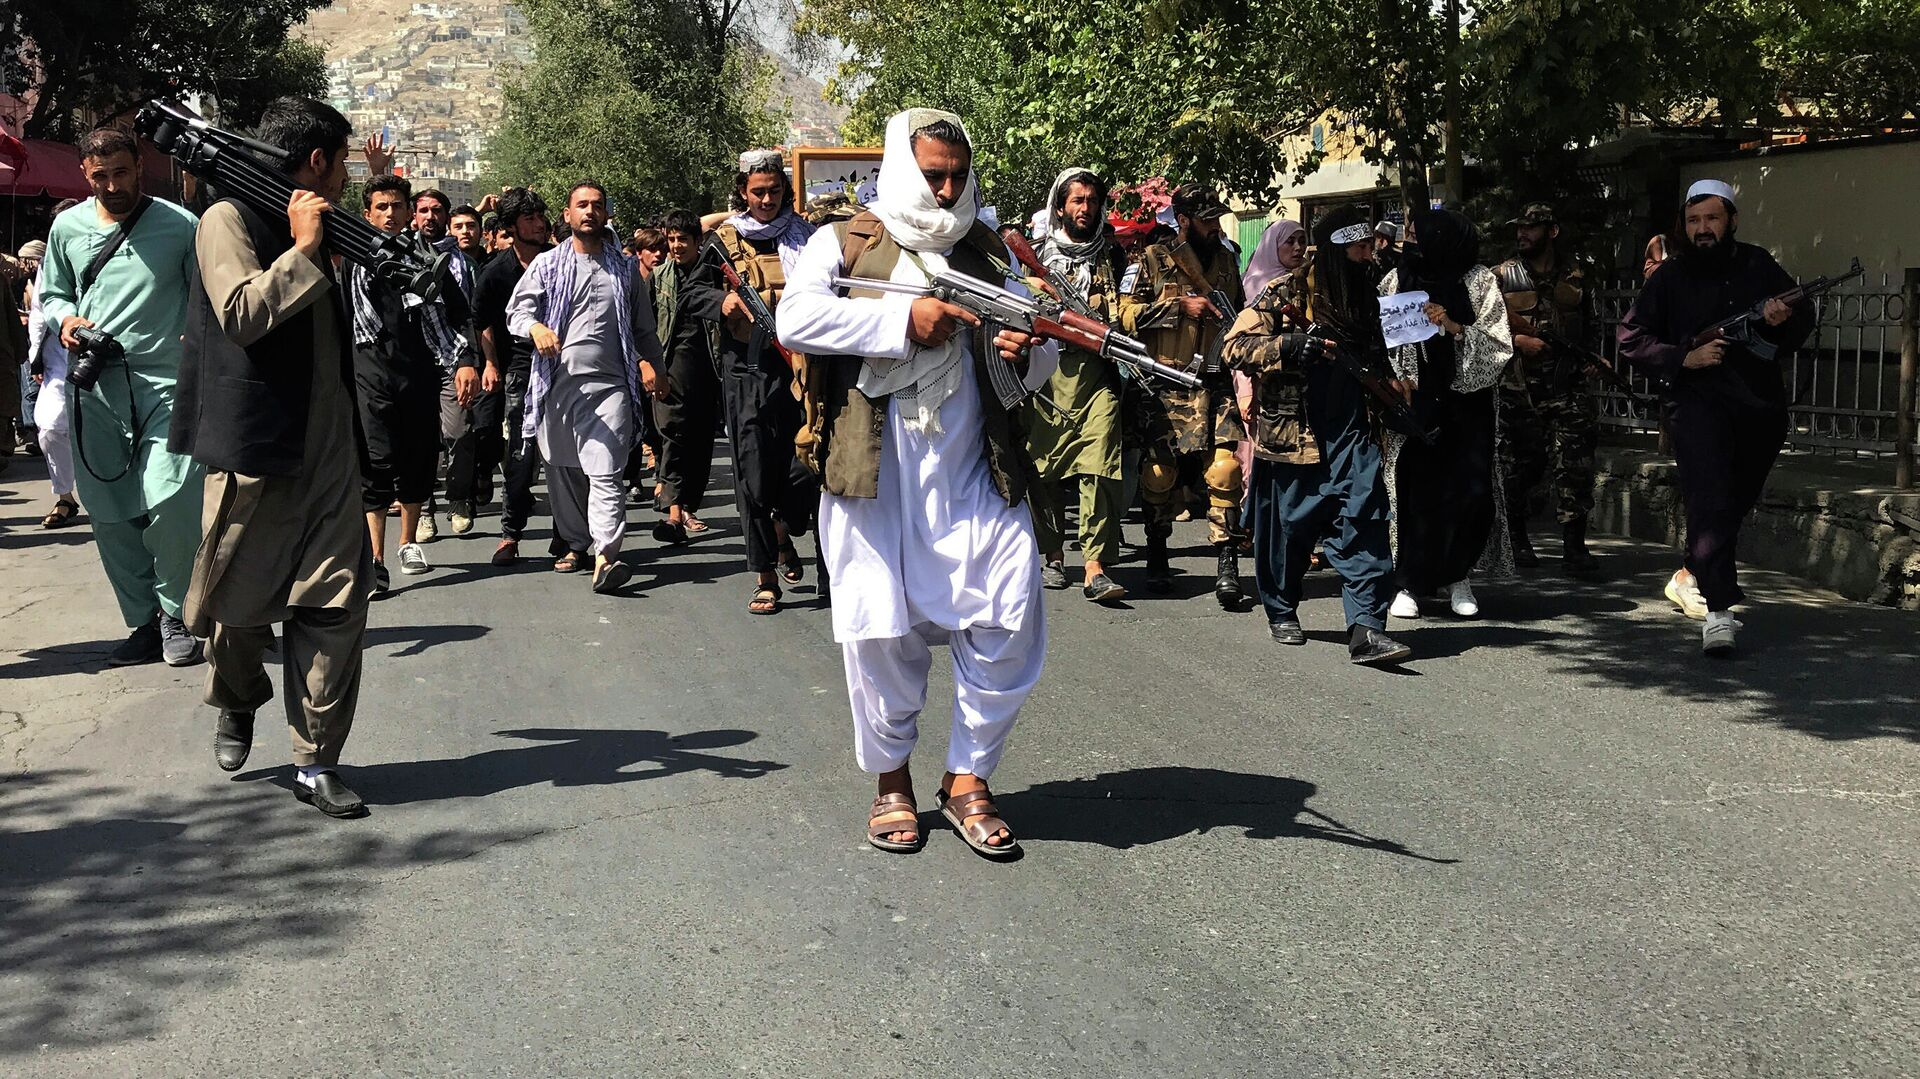 Боевики Талибана* на улице Кабула - РИА Новости, 1920, 14.09.2021